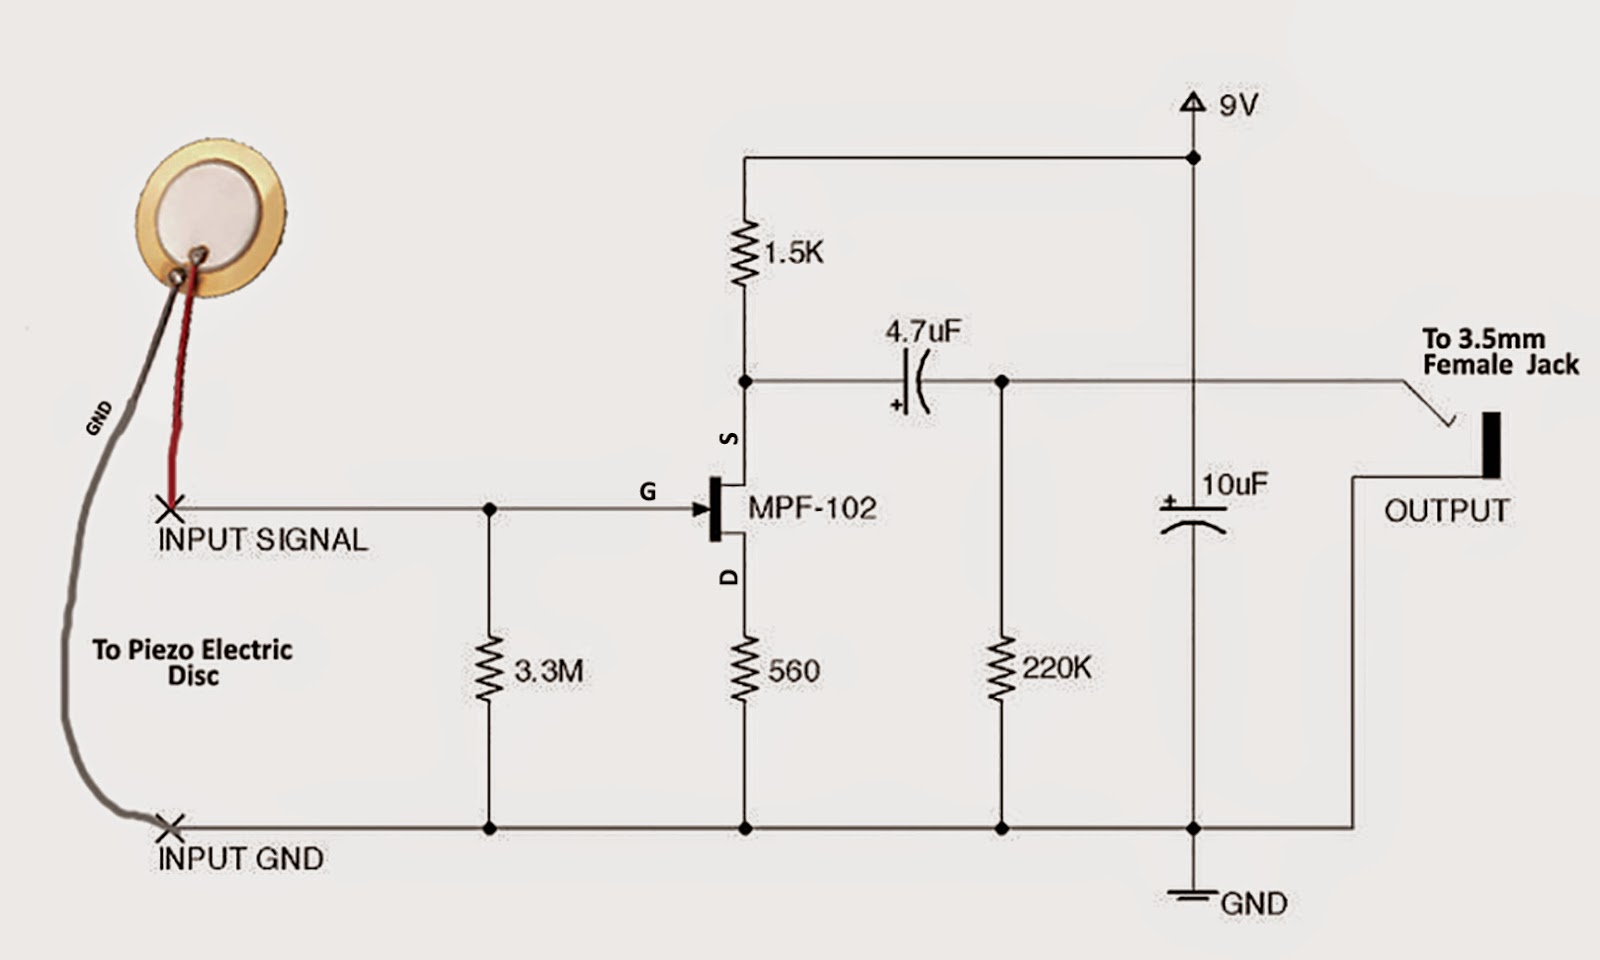 Fascinating noi canceling cb microphone wiring diagram l ideas sennheiser hm46 wiring diagram wiring zephyr range hood wiring swarovskicordoba Gallery